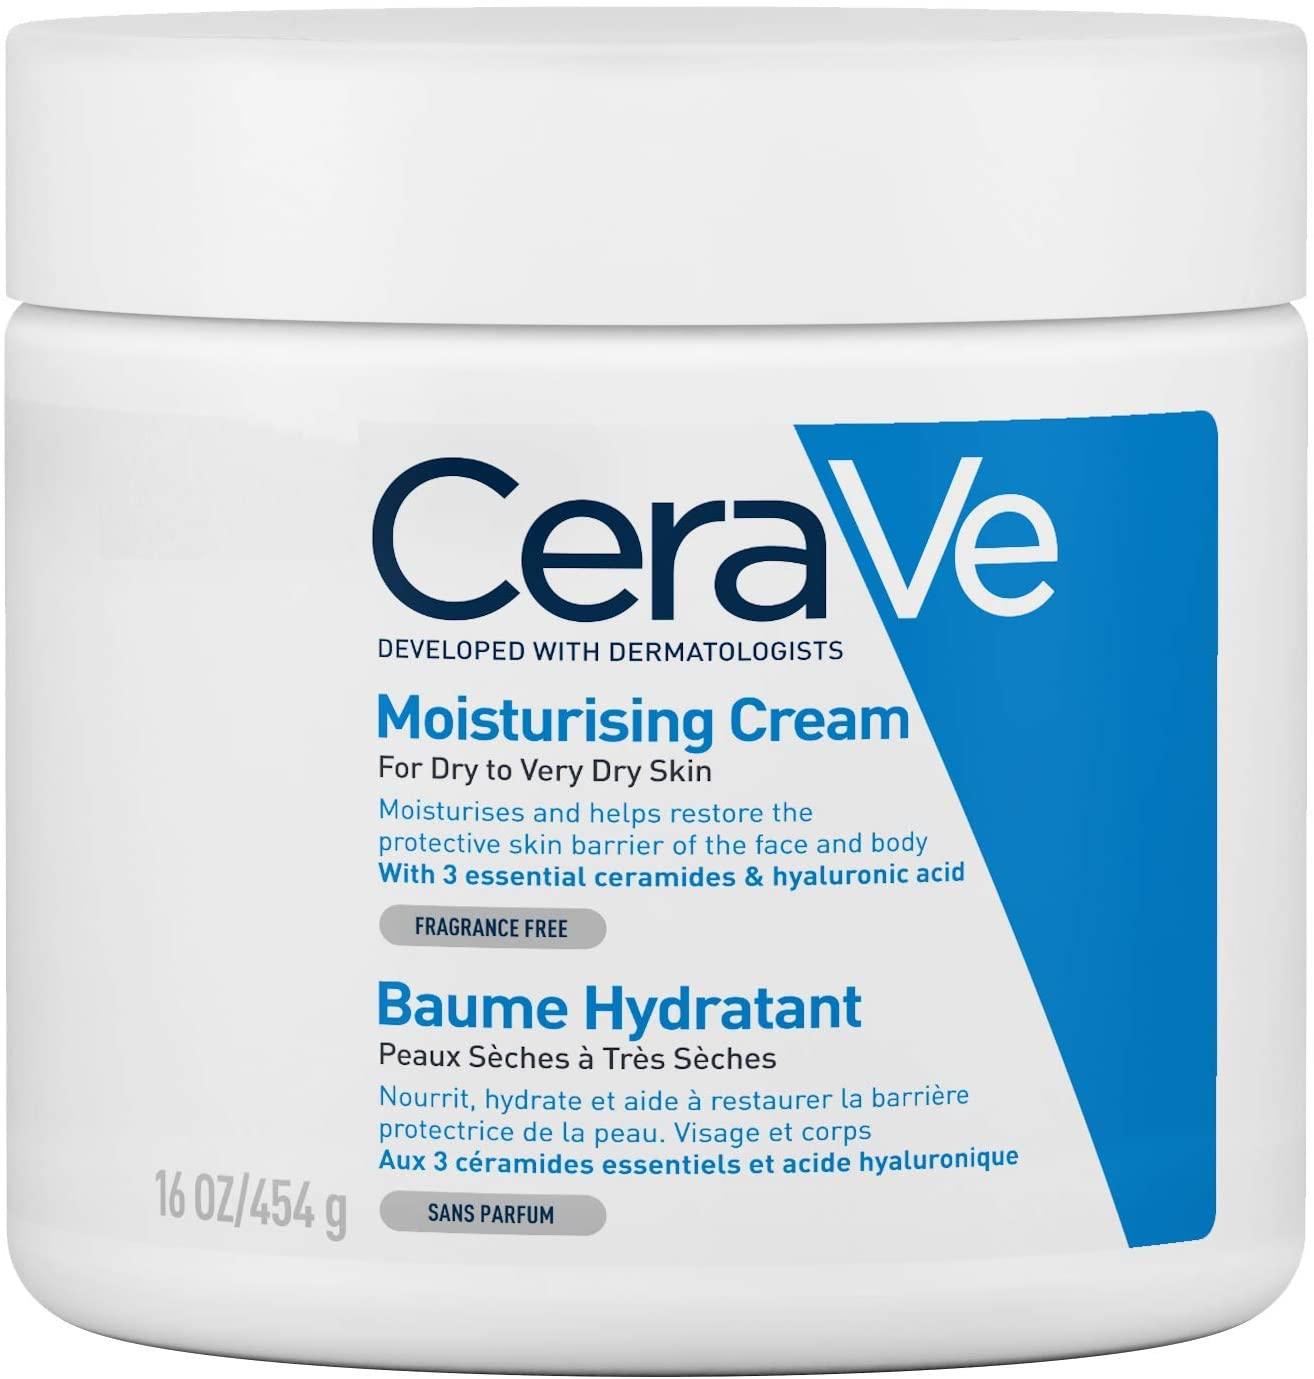 CeraVe Creme Hidratante Pele Seca